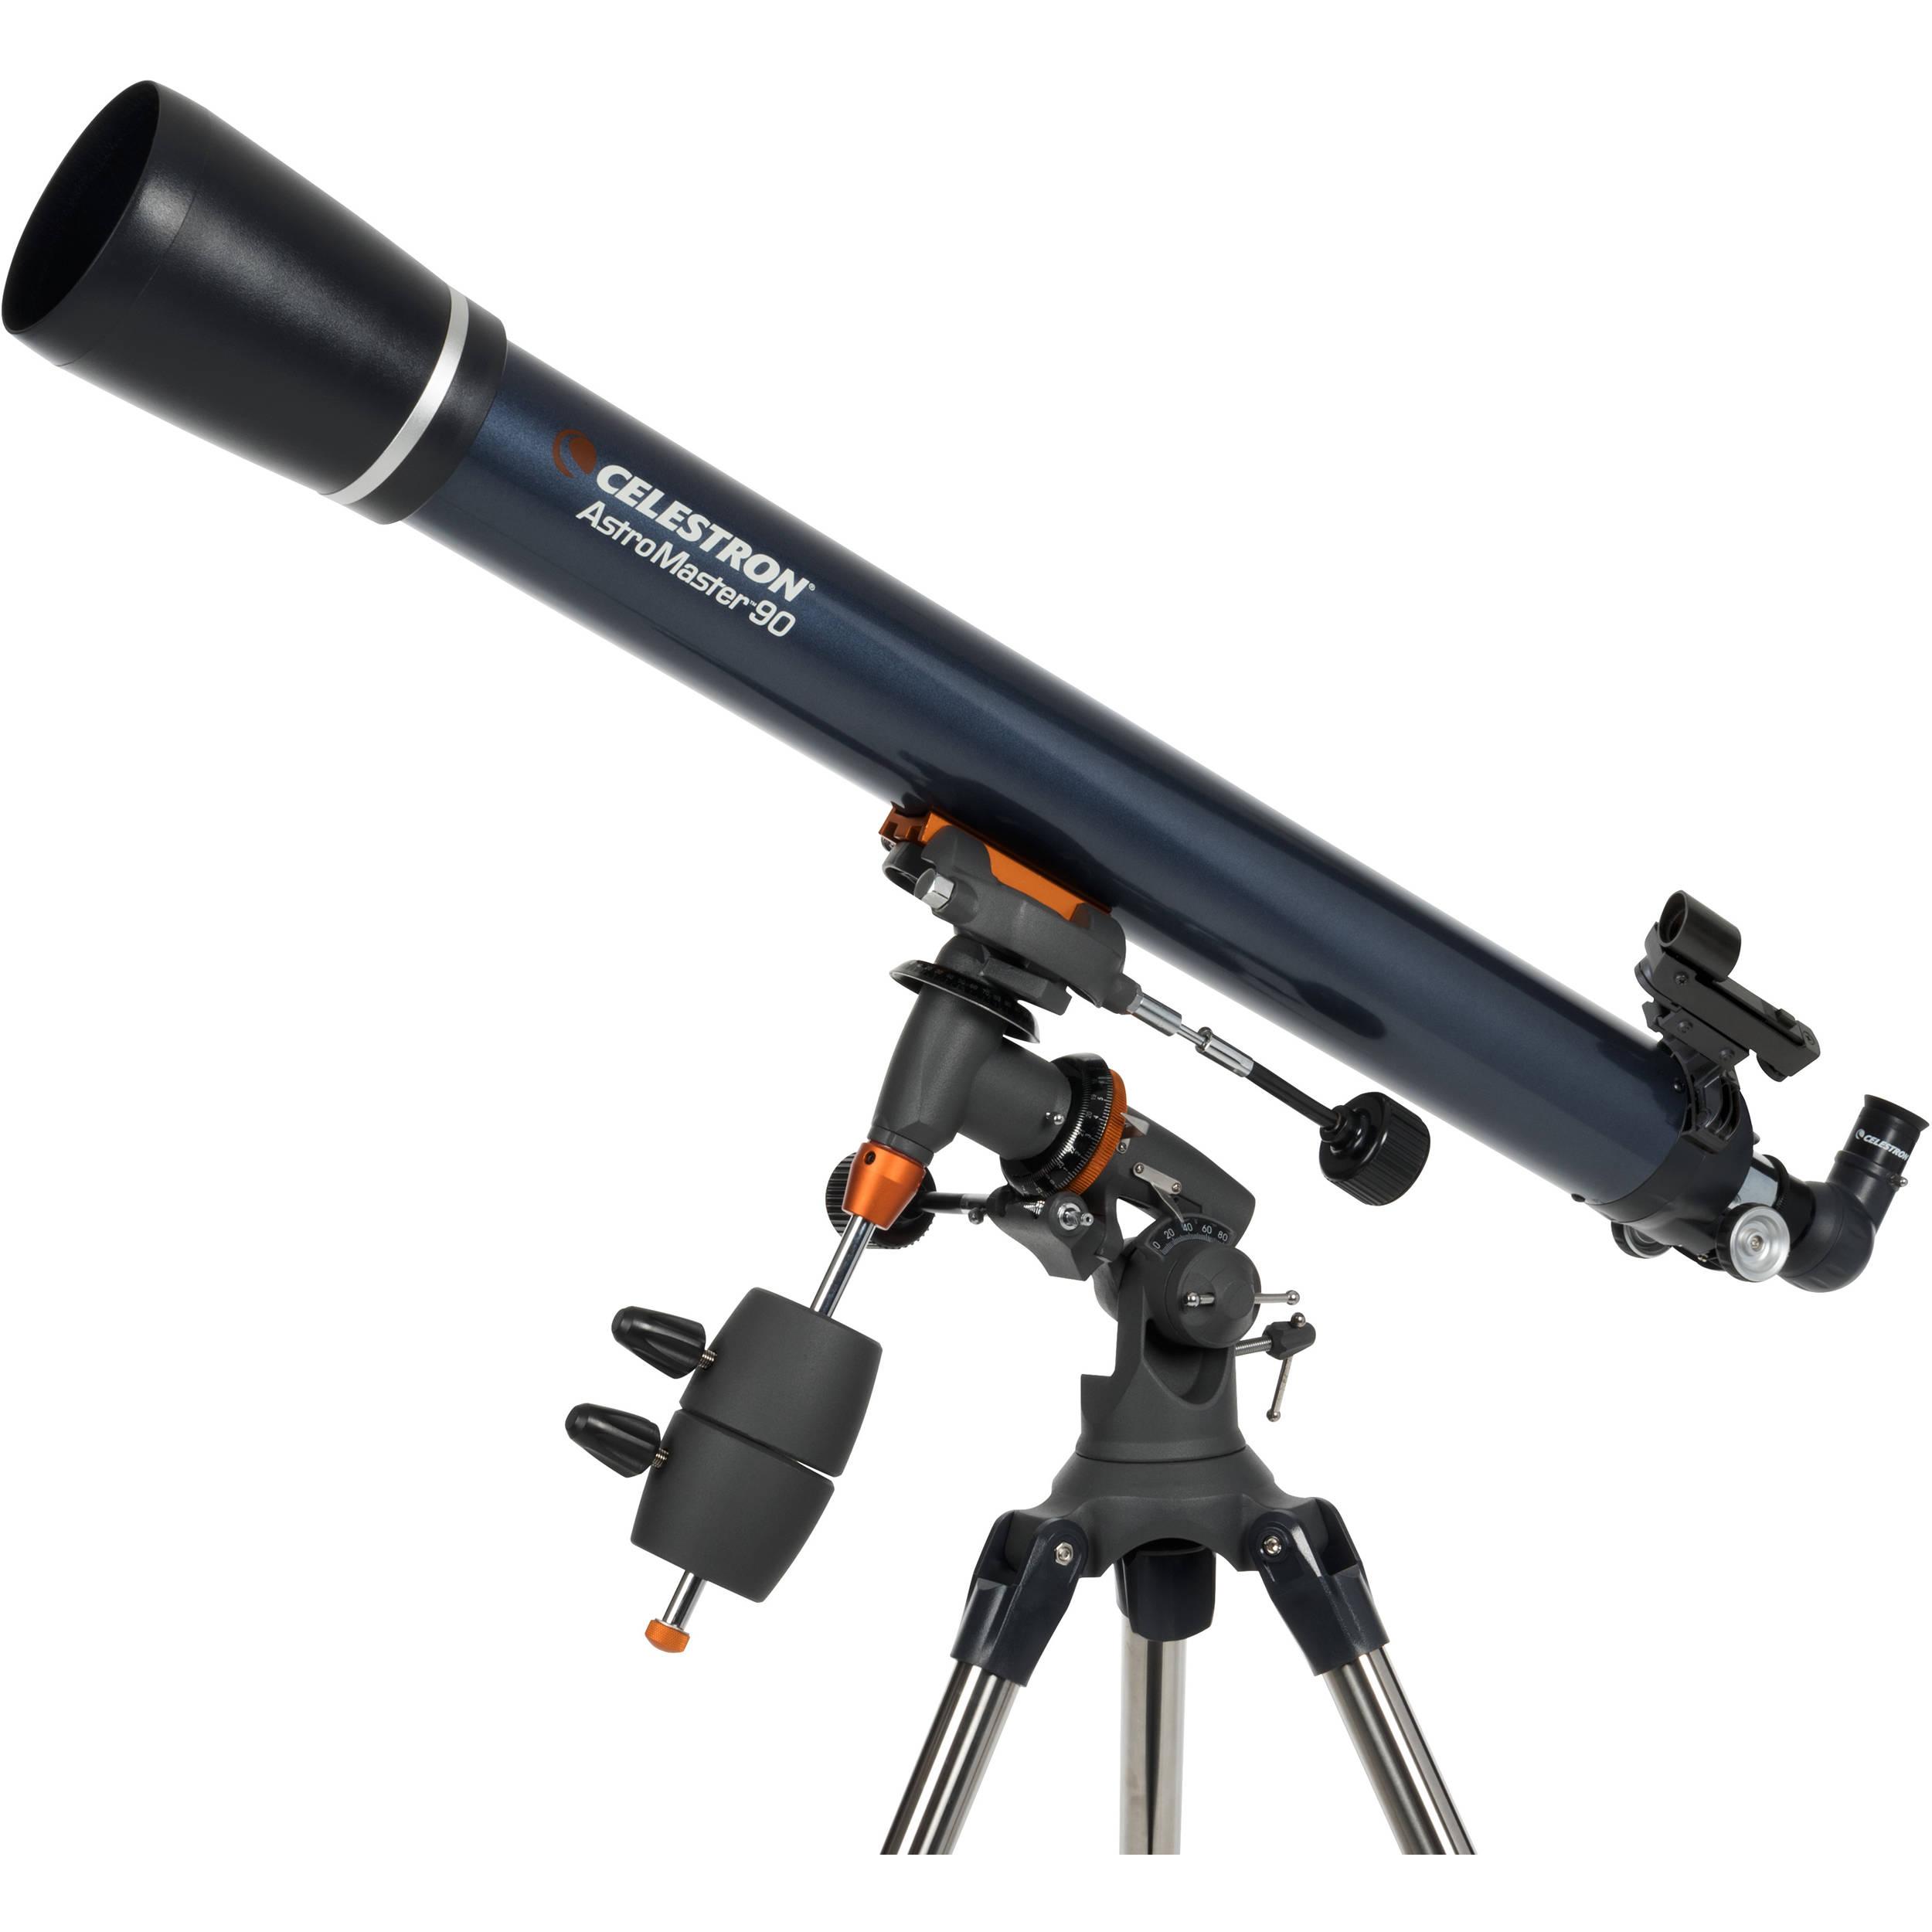 Celestron AstroMaster 90 AZ